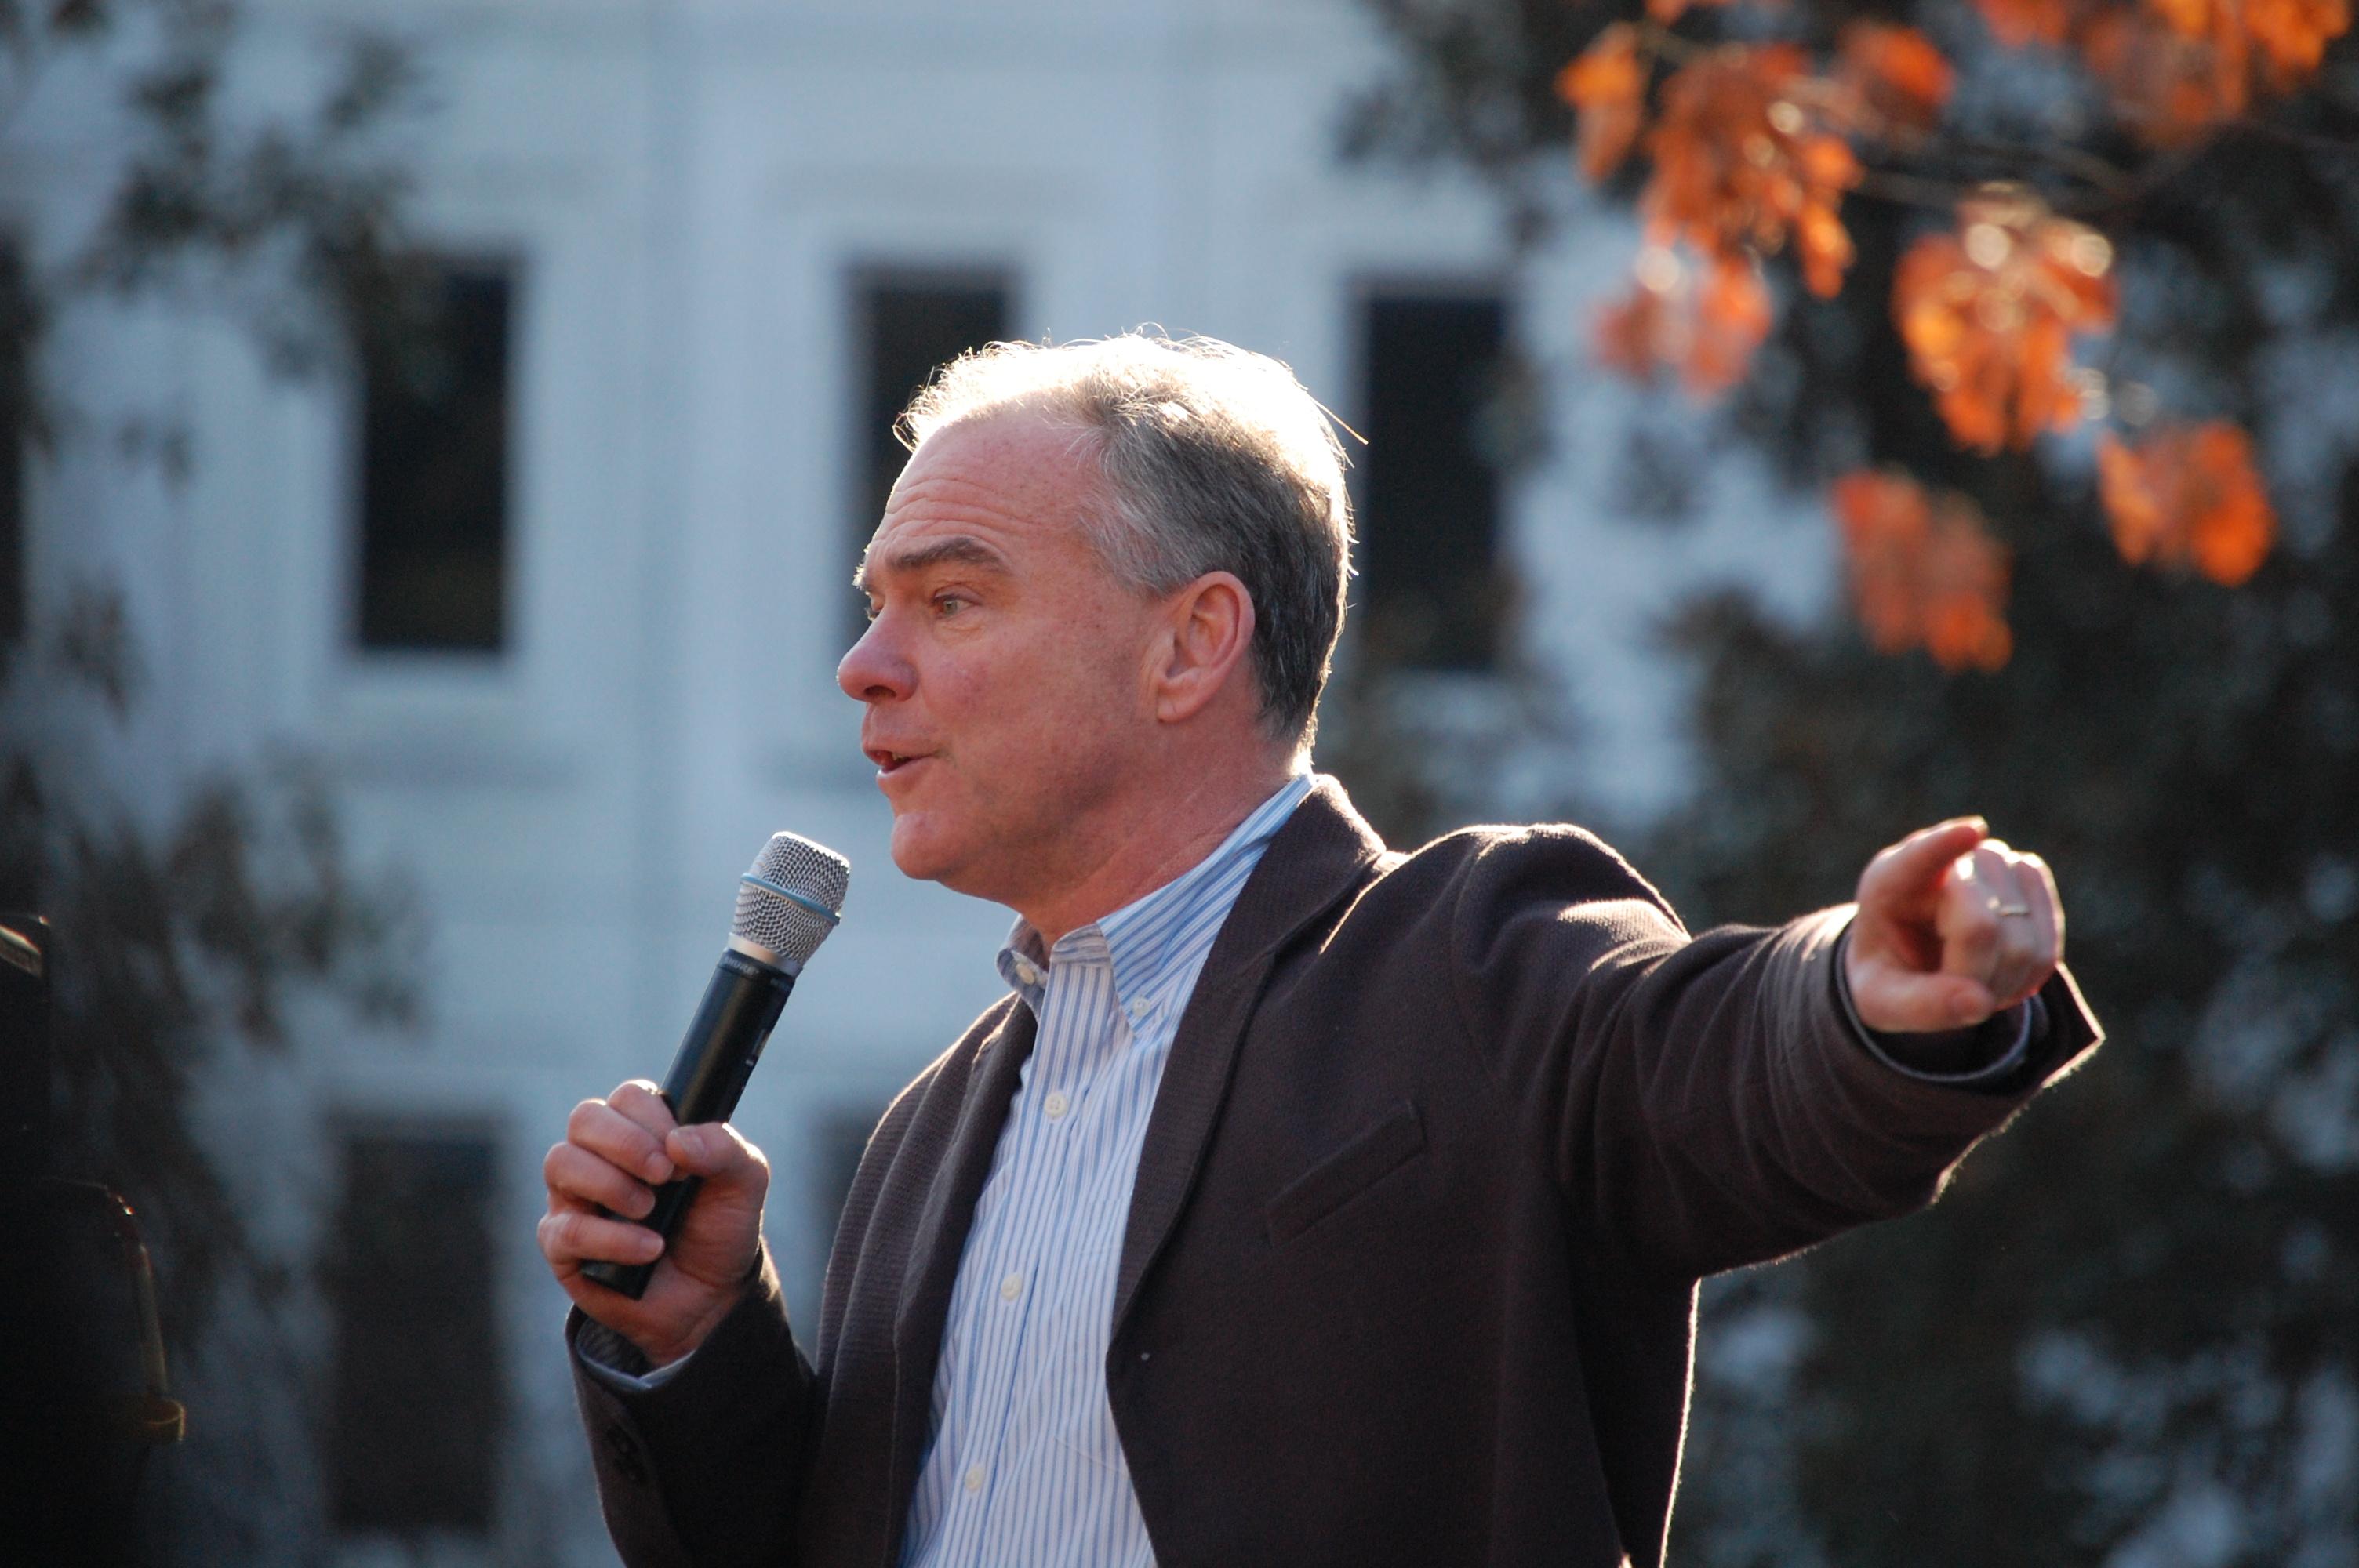 U.S. Sen. Tim Kaine spoke at the Richmond rally on Saturday. Photo by Jim Thomma.